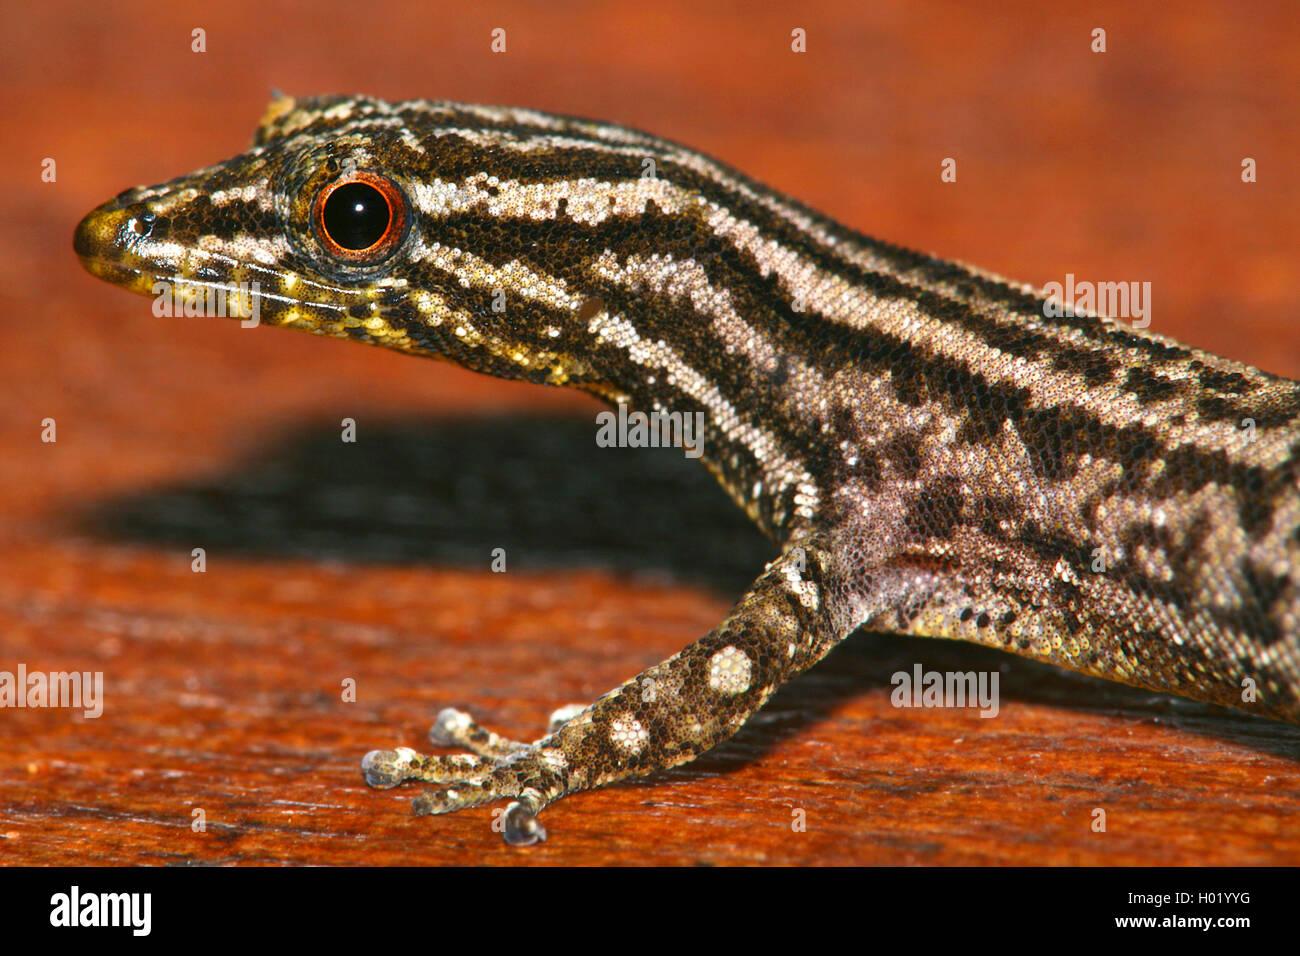 Marked-Throated Pigmy Gecko (Sphaerodactylus graptolaemus), Porträt, Costa Rica Stockfoto